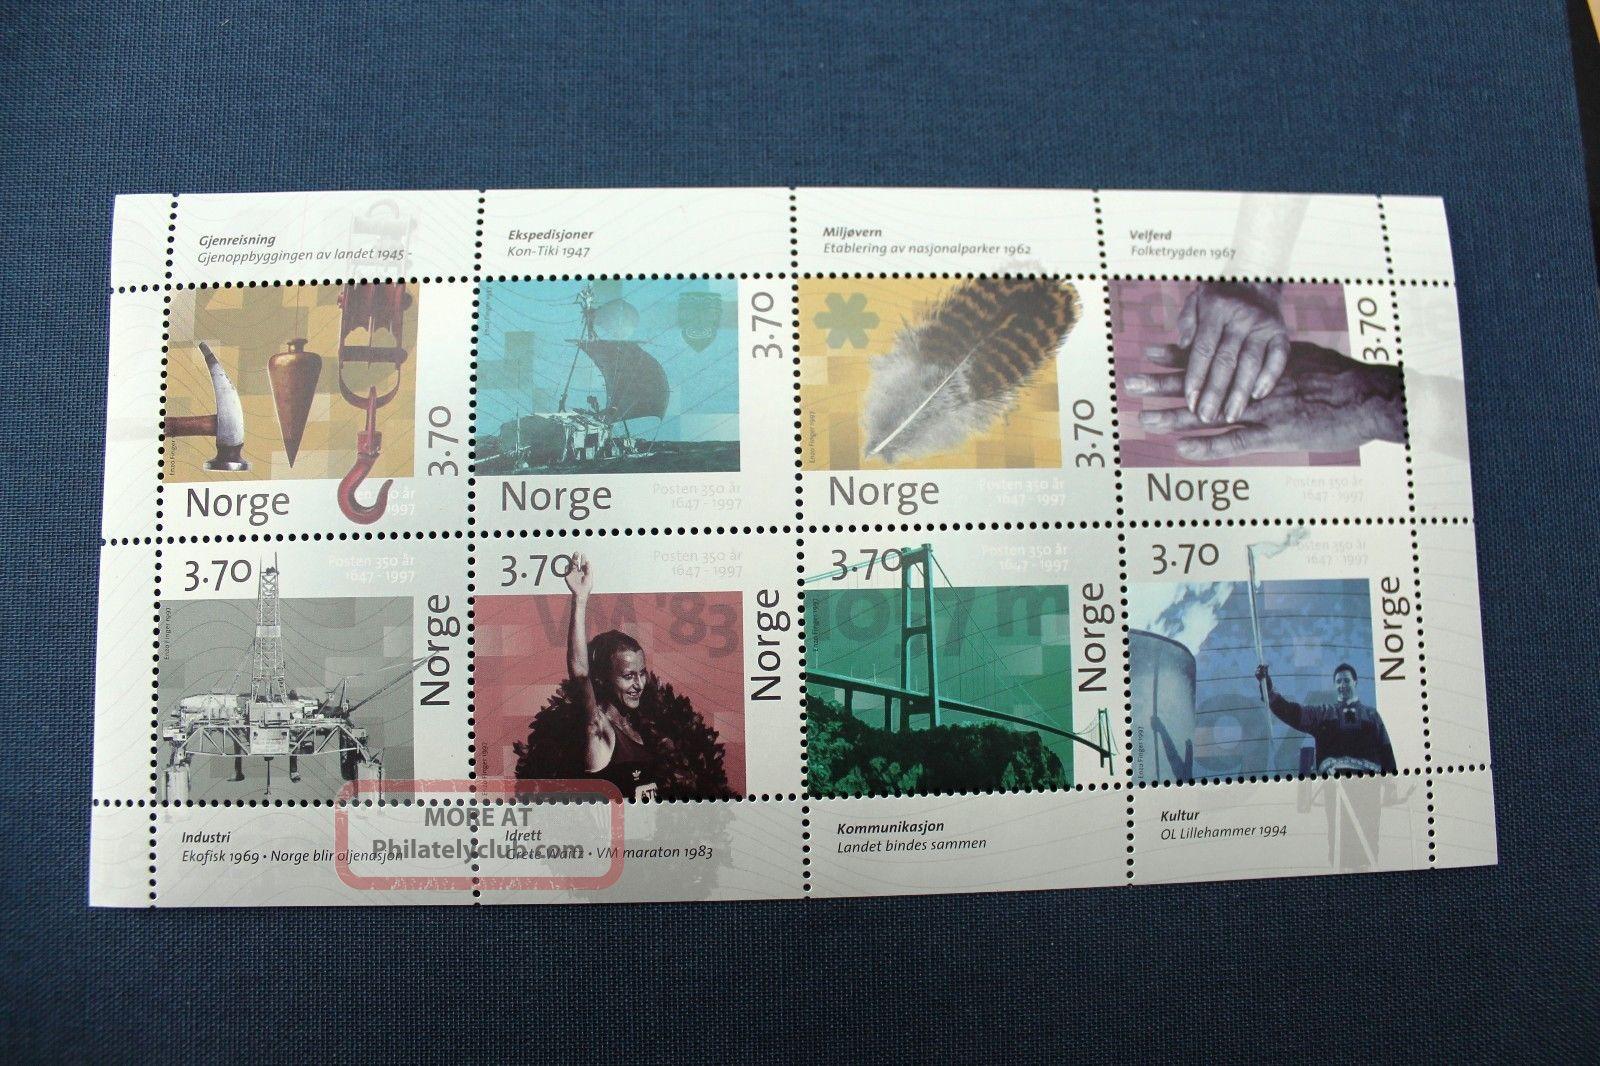 Norway Minisheet 1997 350th Anniversary Of The Norway Post Europe photo